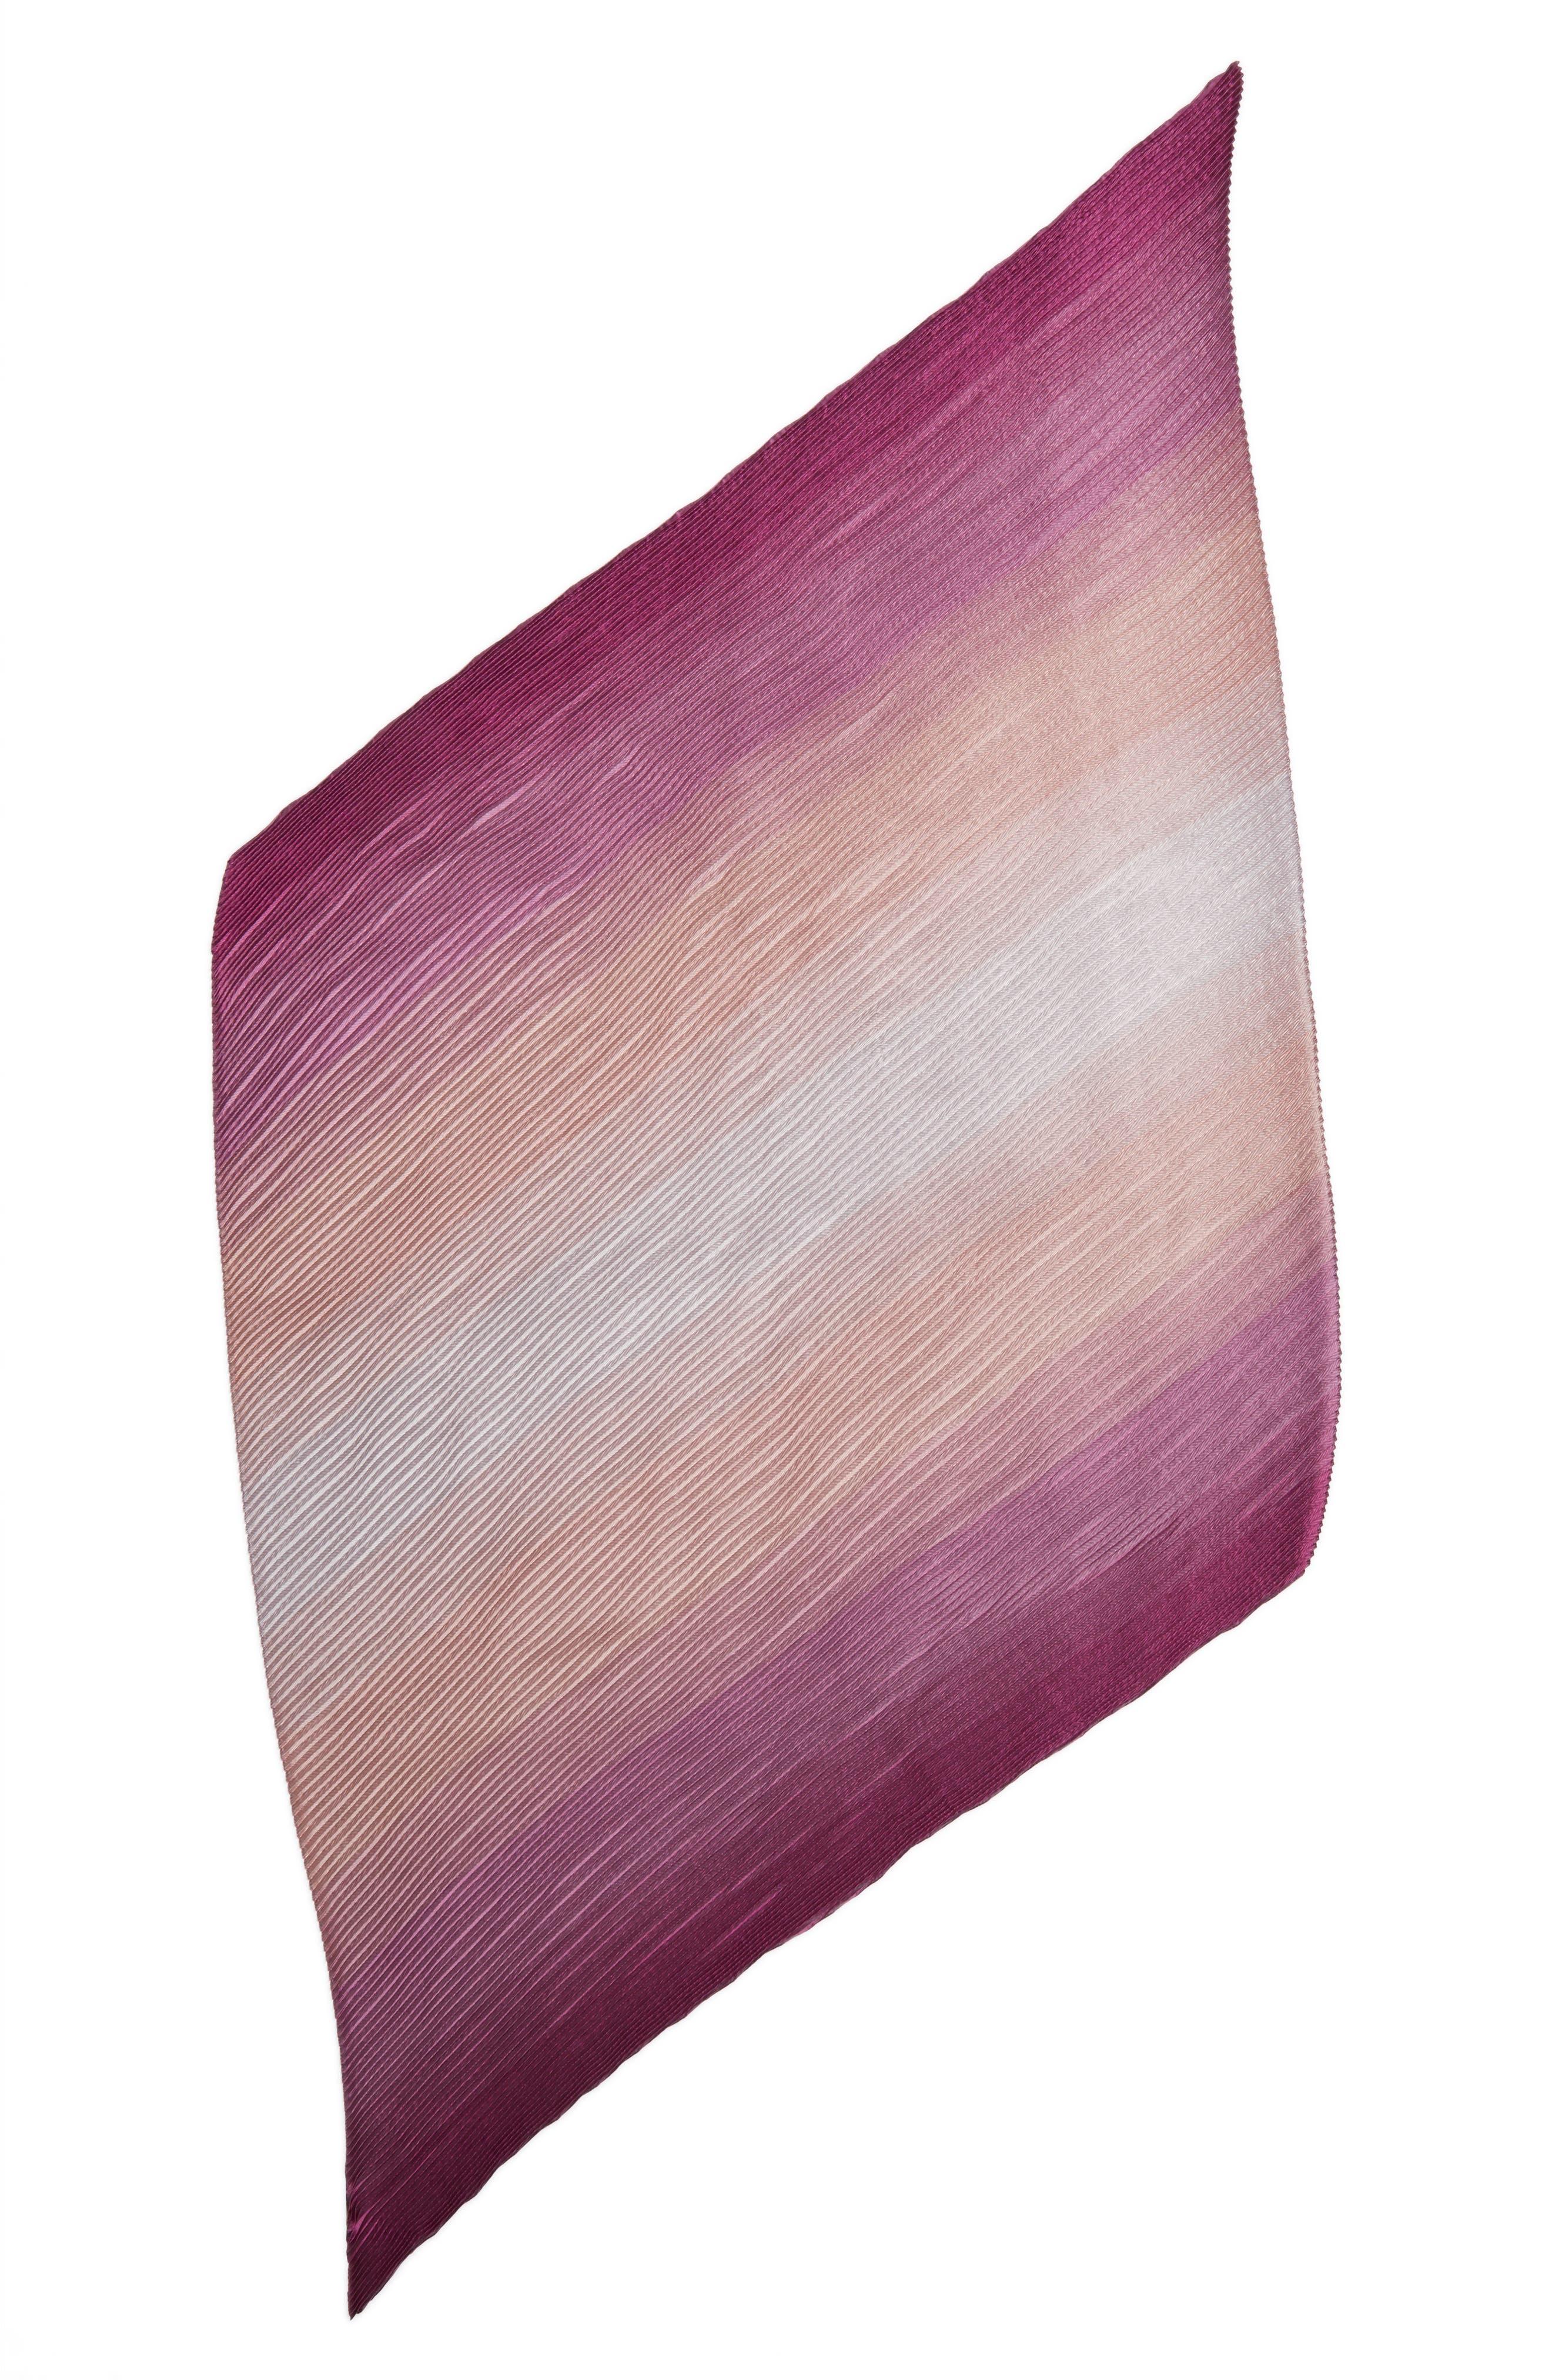 Herringbone Plissé Scarf,                             Main thumbnail 1, color,                             664